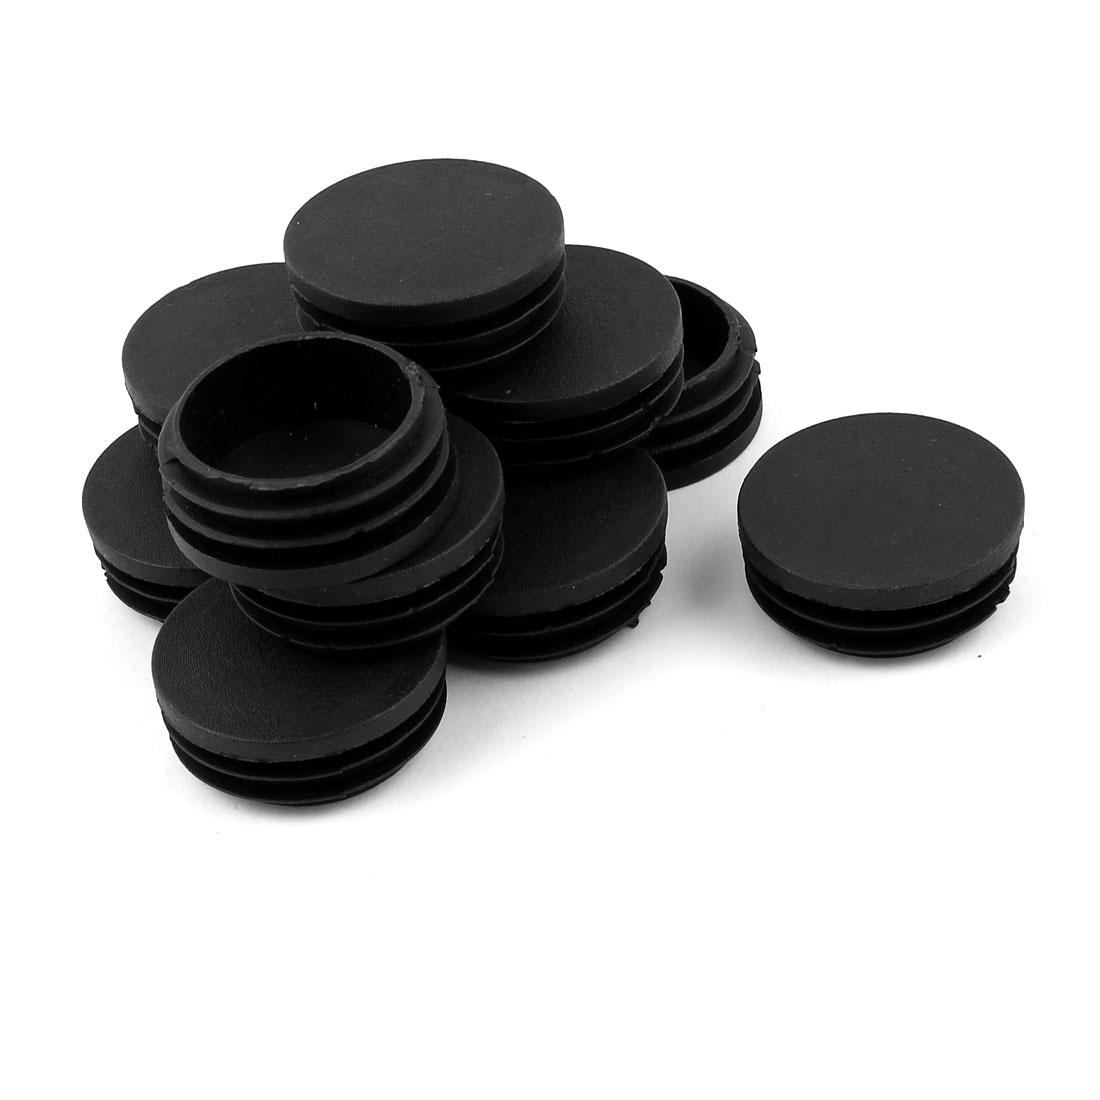 12 Pcs Black Plastic 45mm Dia Round Tubing Tube Insert Caps Covers